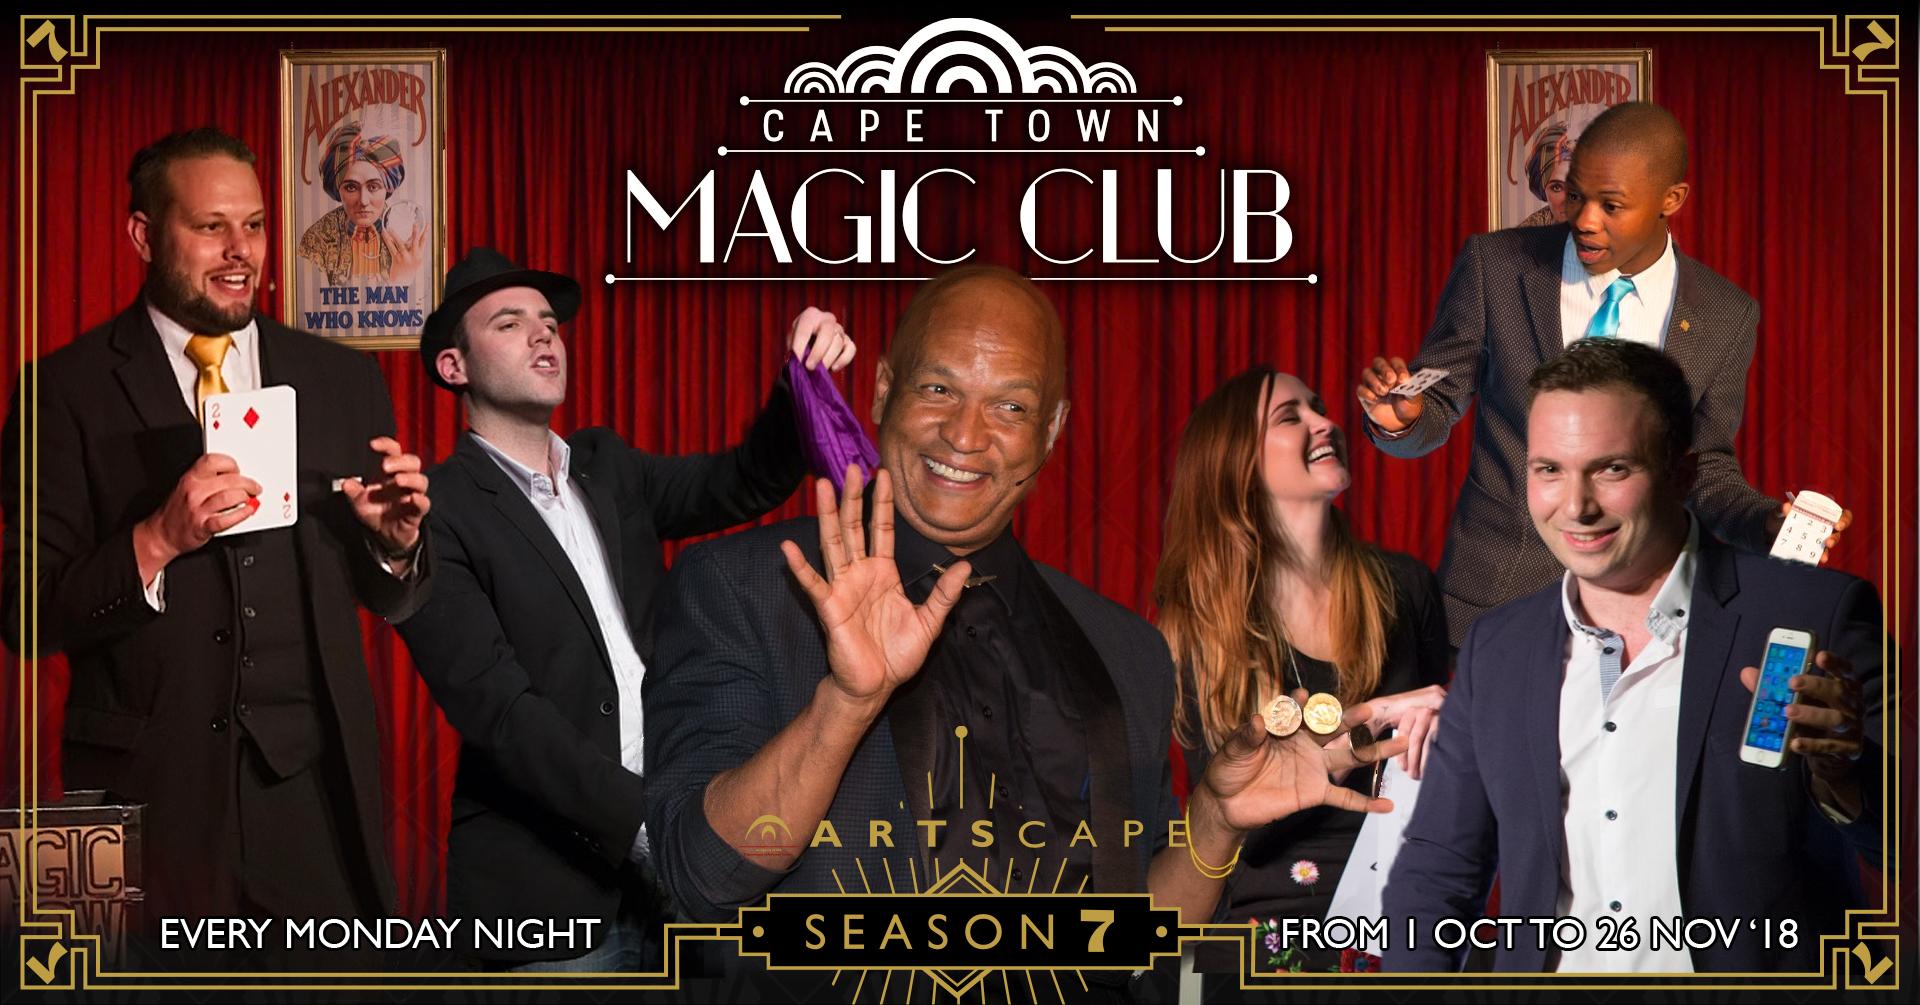 MONDAY NIGHT MAGIC